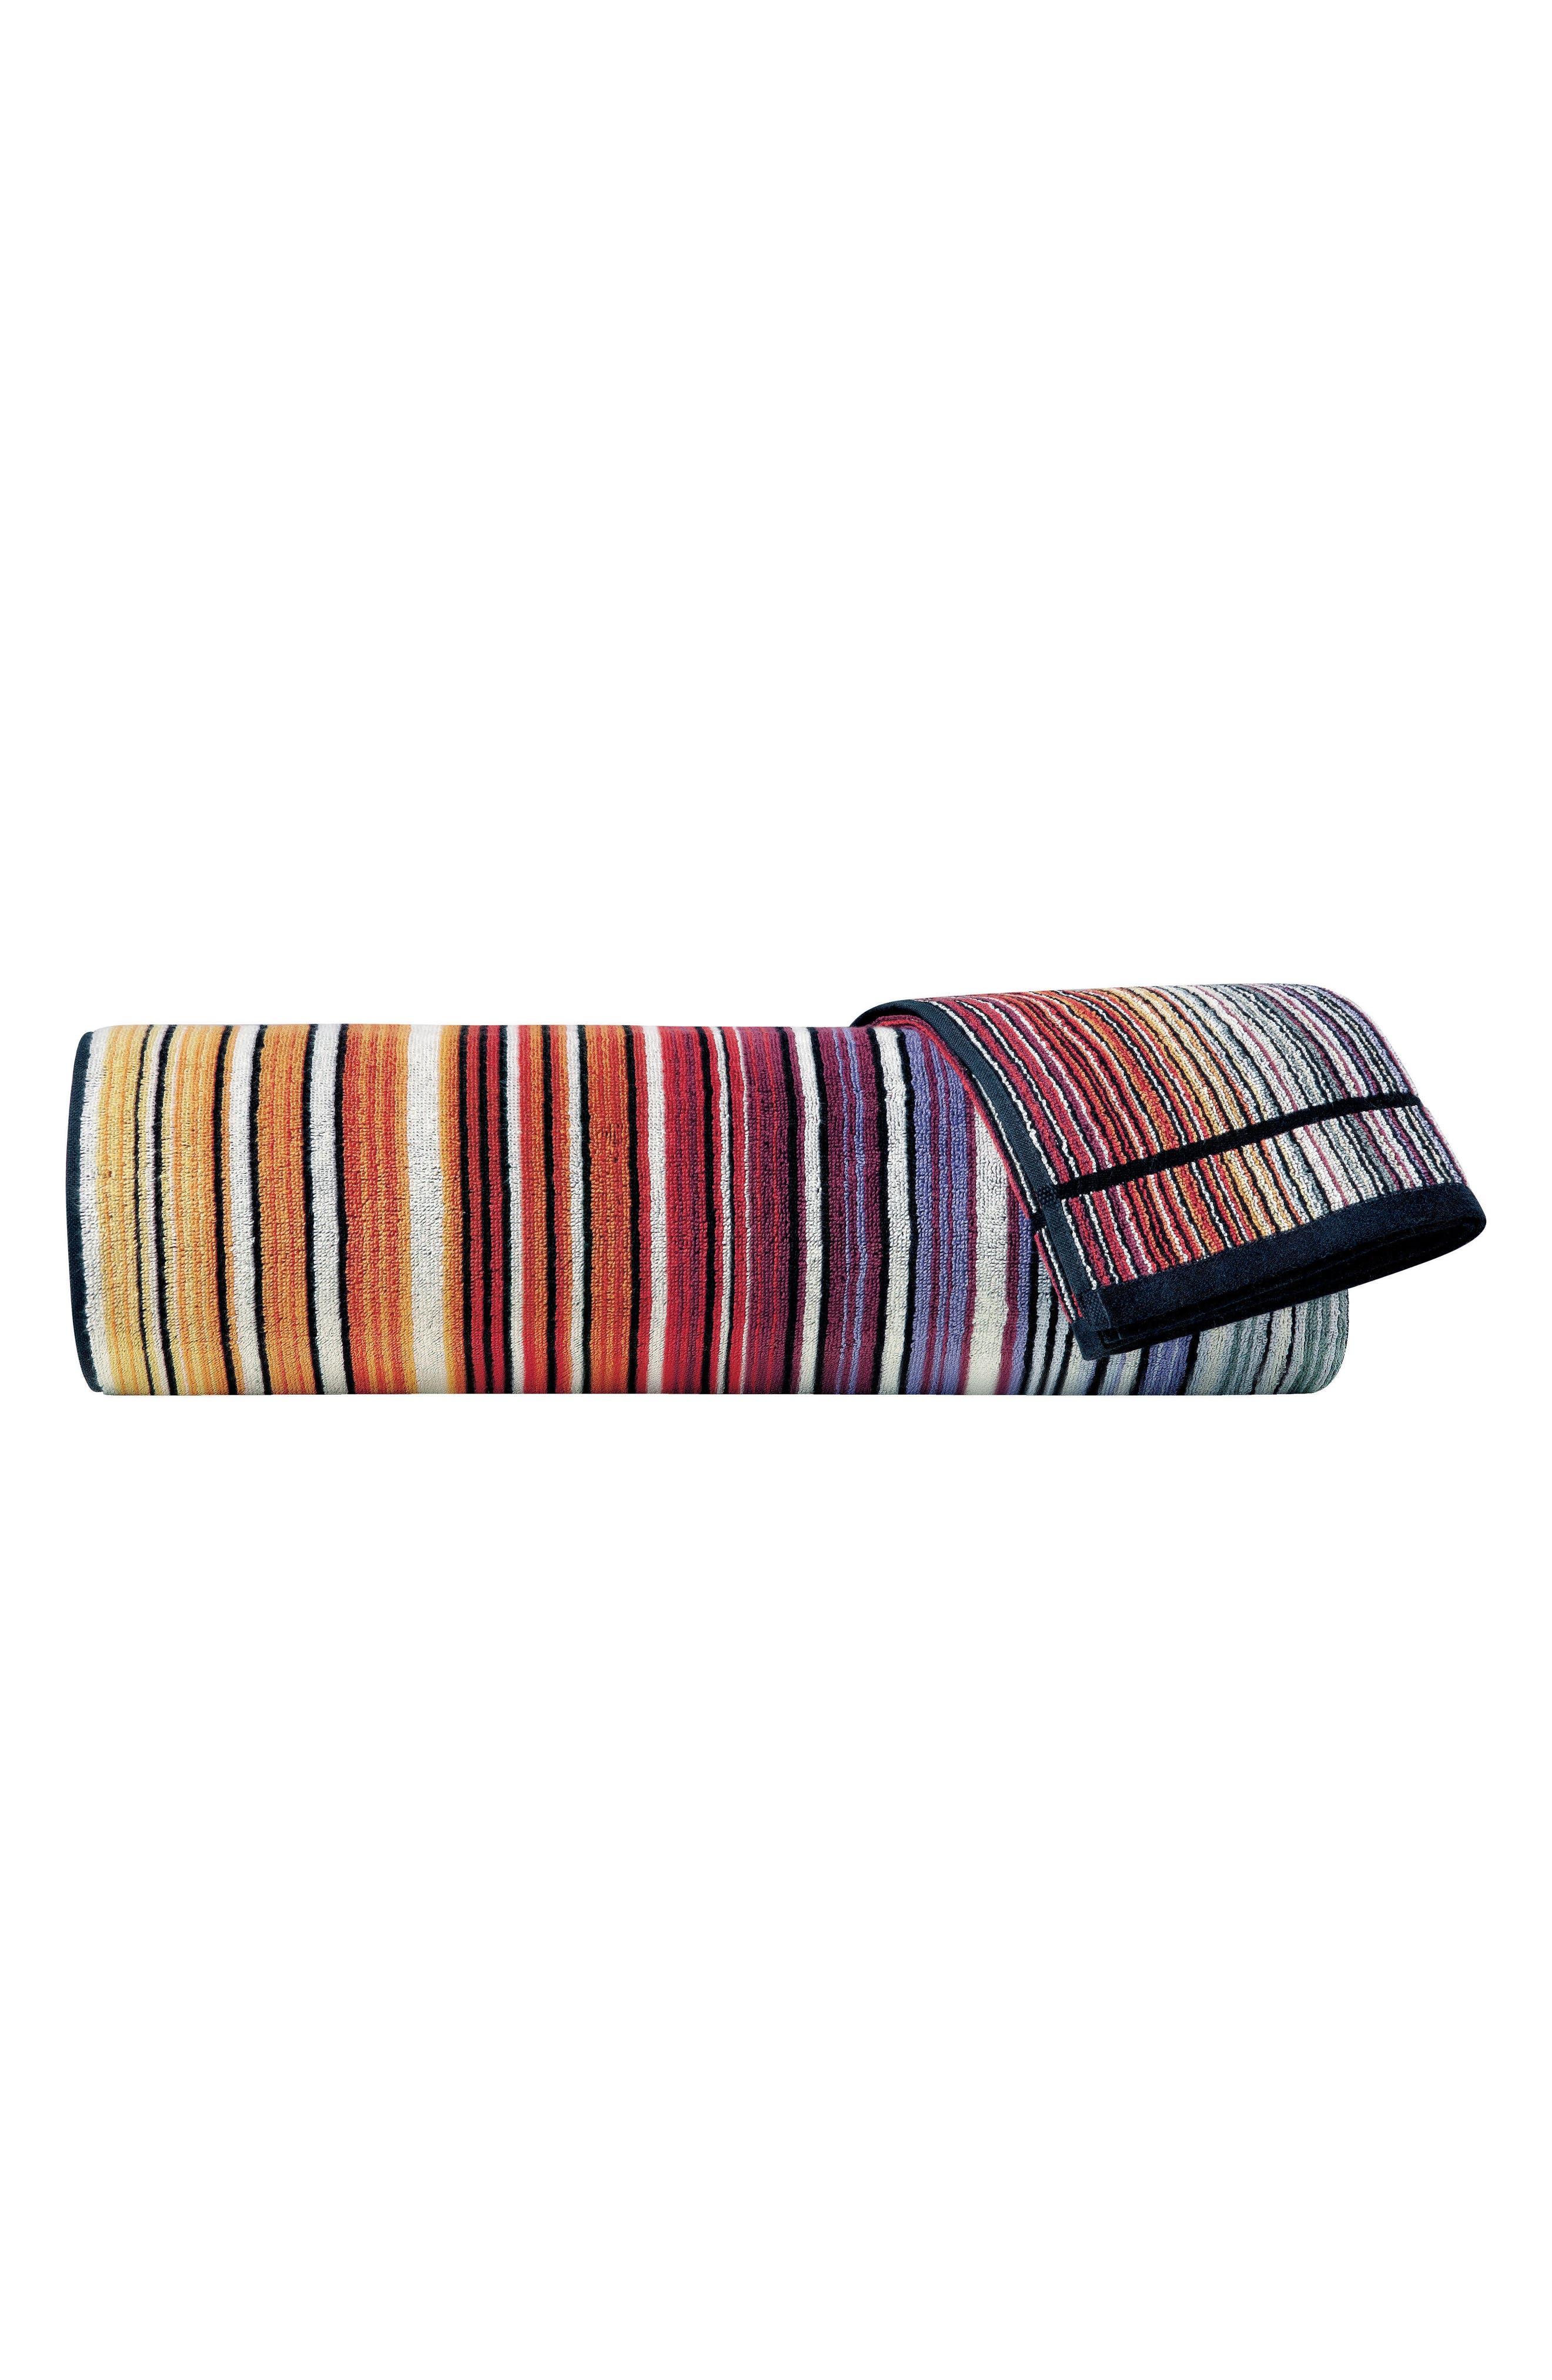 Missoni Tabata Bath Towel,                         Main,                         color, 600